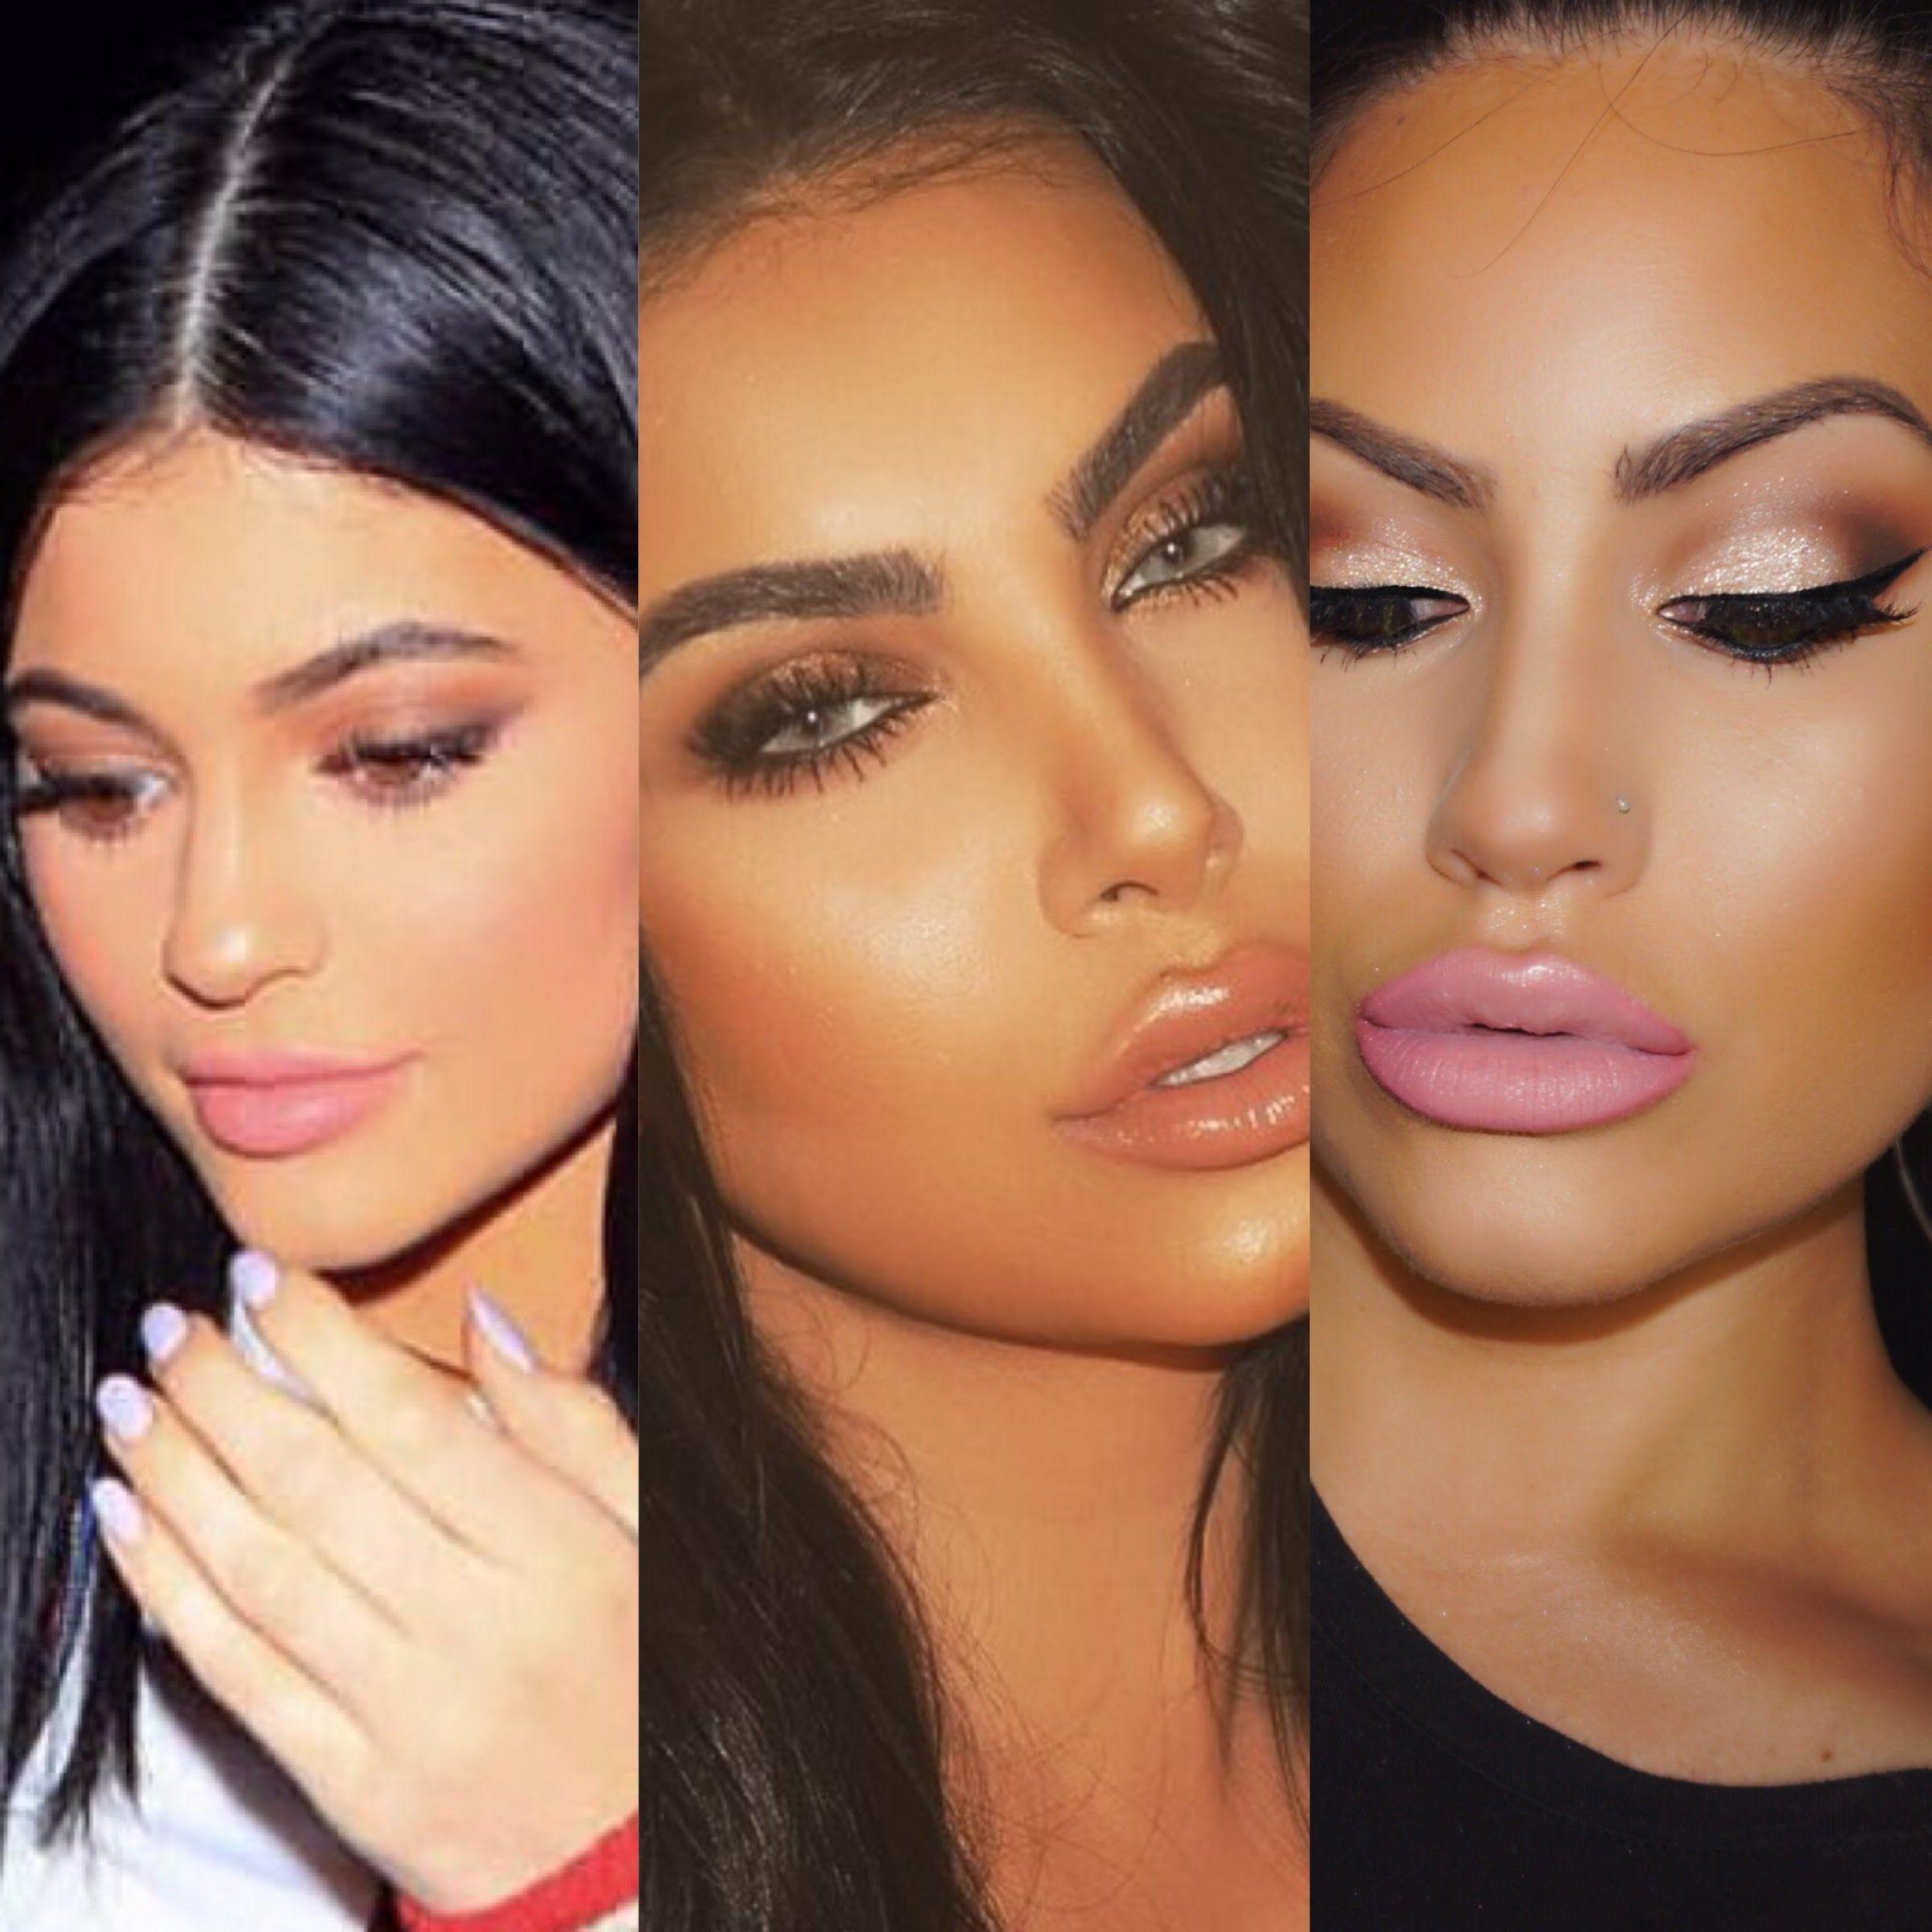 Kylie Jenner And Hrush Favorite Makeup Plus Makeup Tutorial Youtube Makeup Tutorial Makeup Tutorials Youtube Makeup